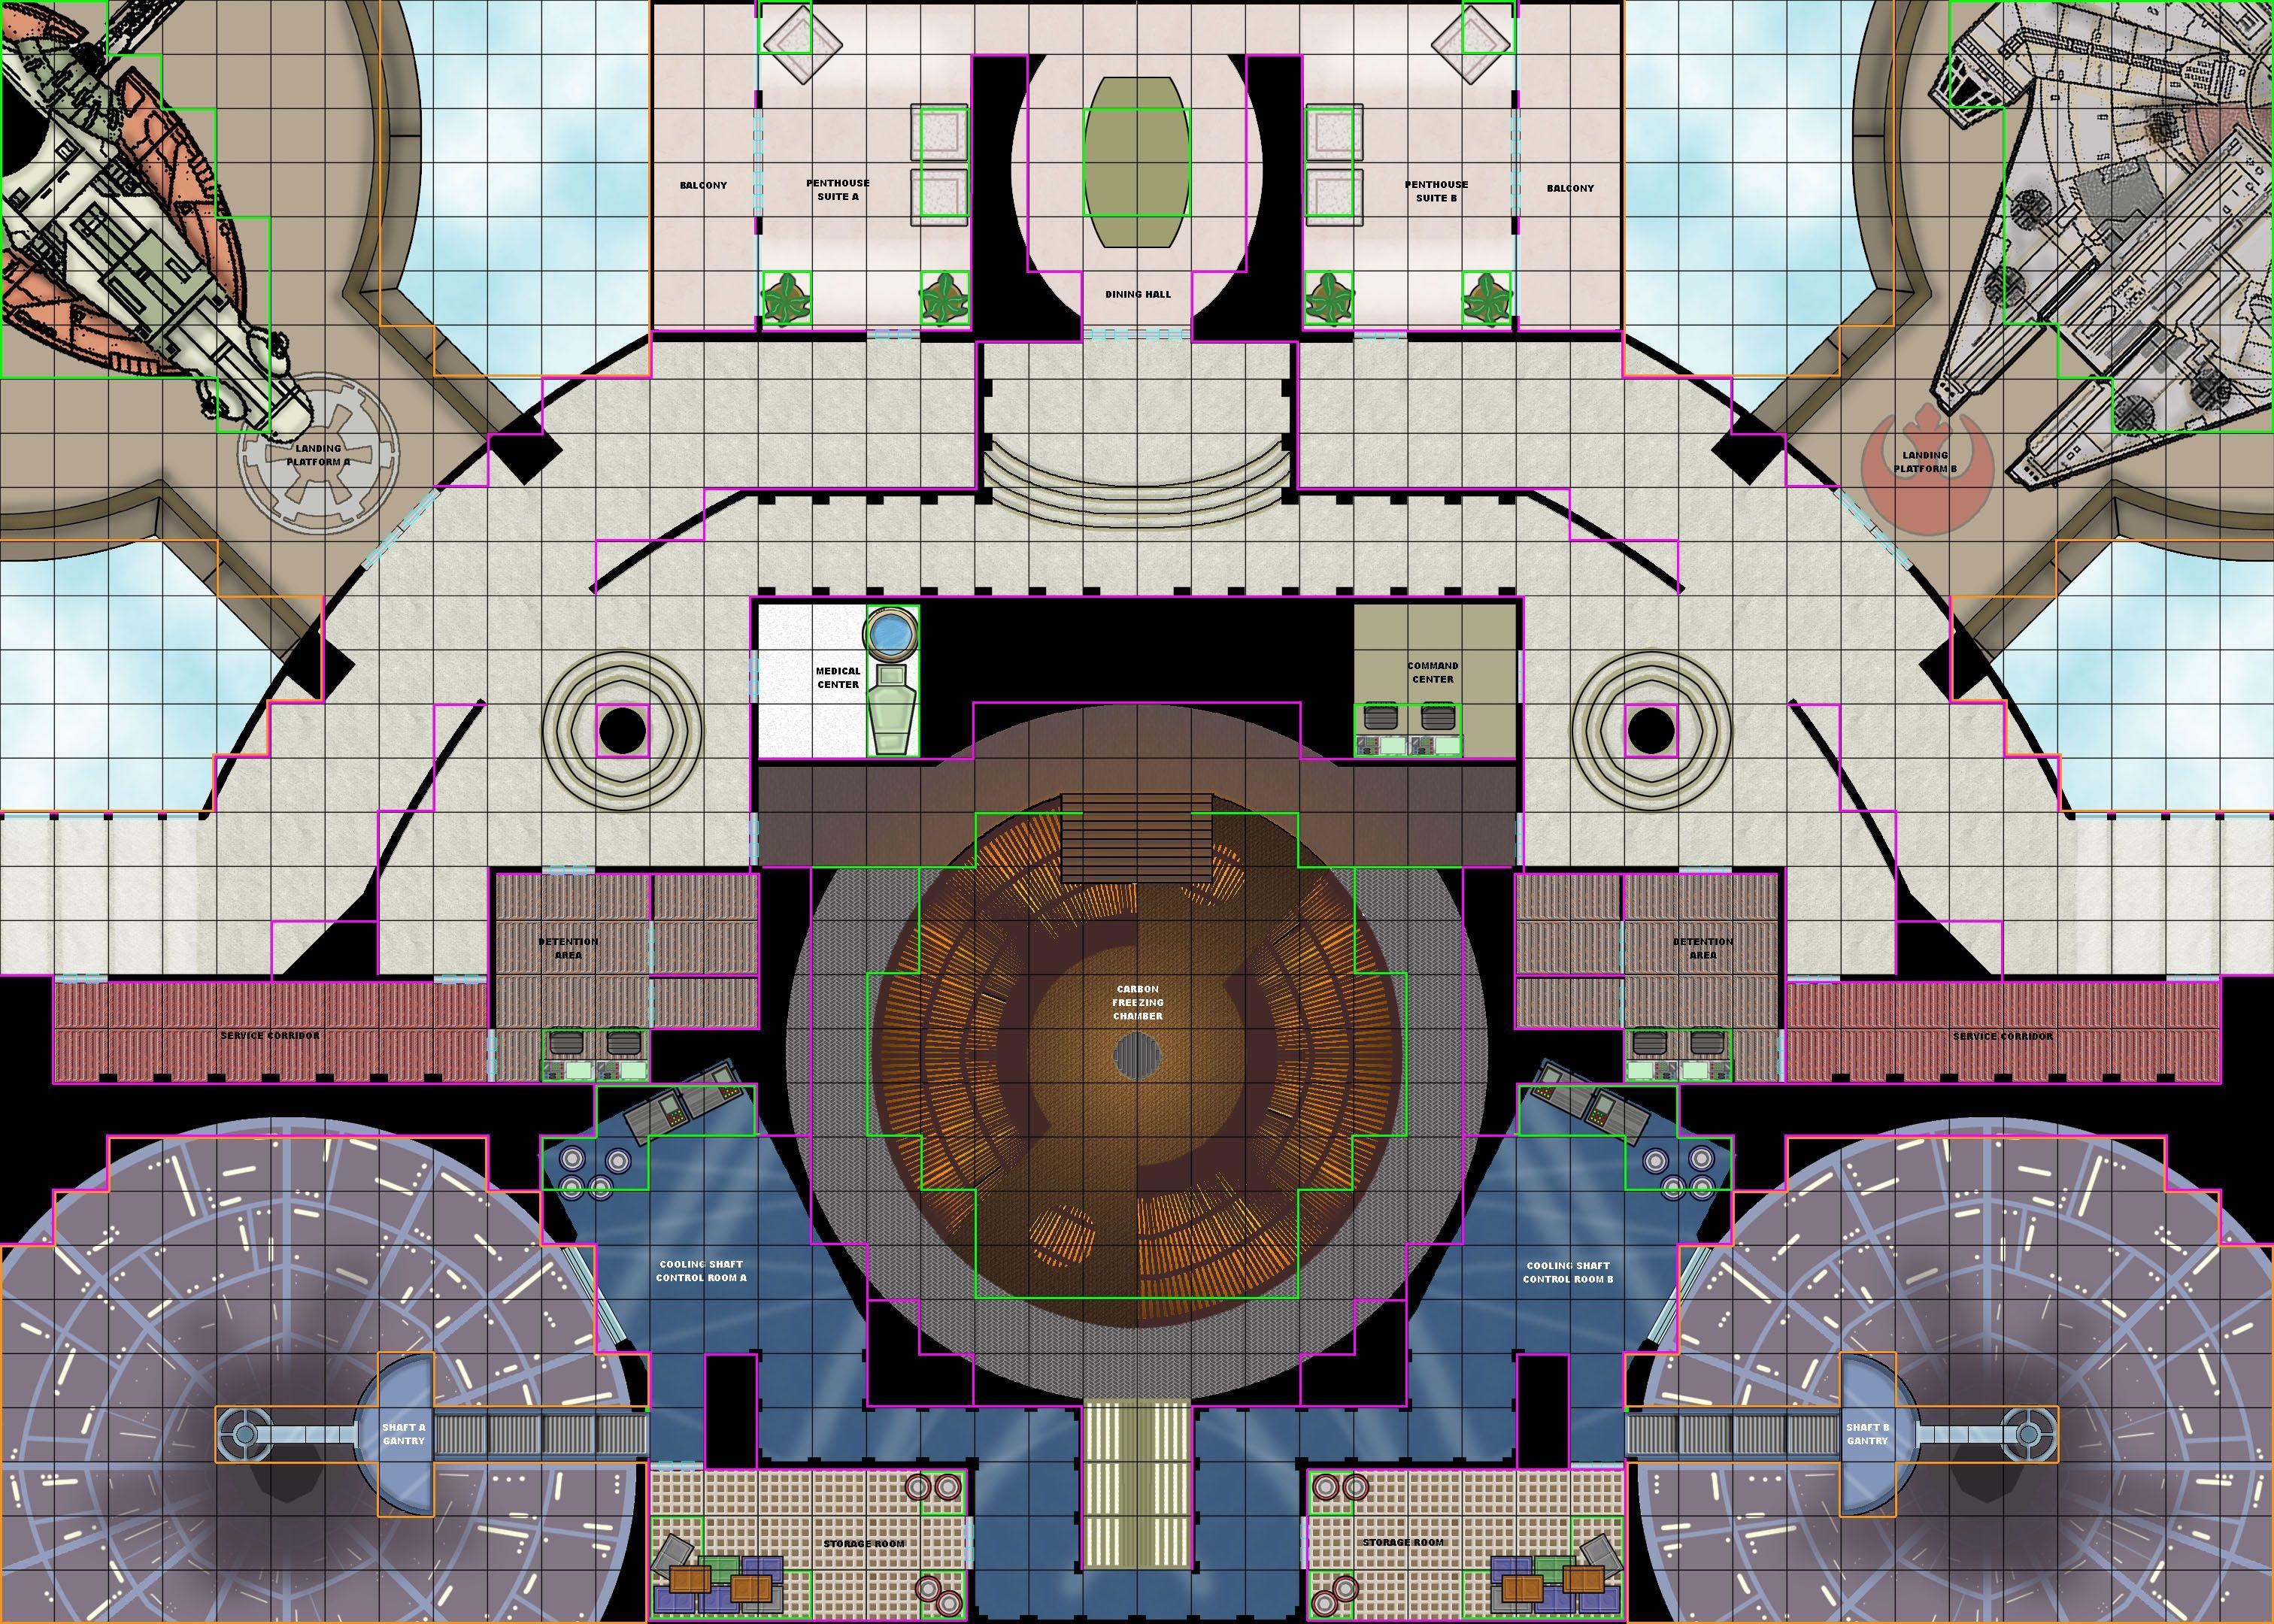 Star Wars Rpg Maps | Cloud City Tile Set C | Star Wars | Pinterest - Star Wars Miniatures Printable Maps